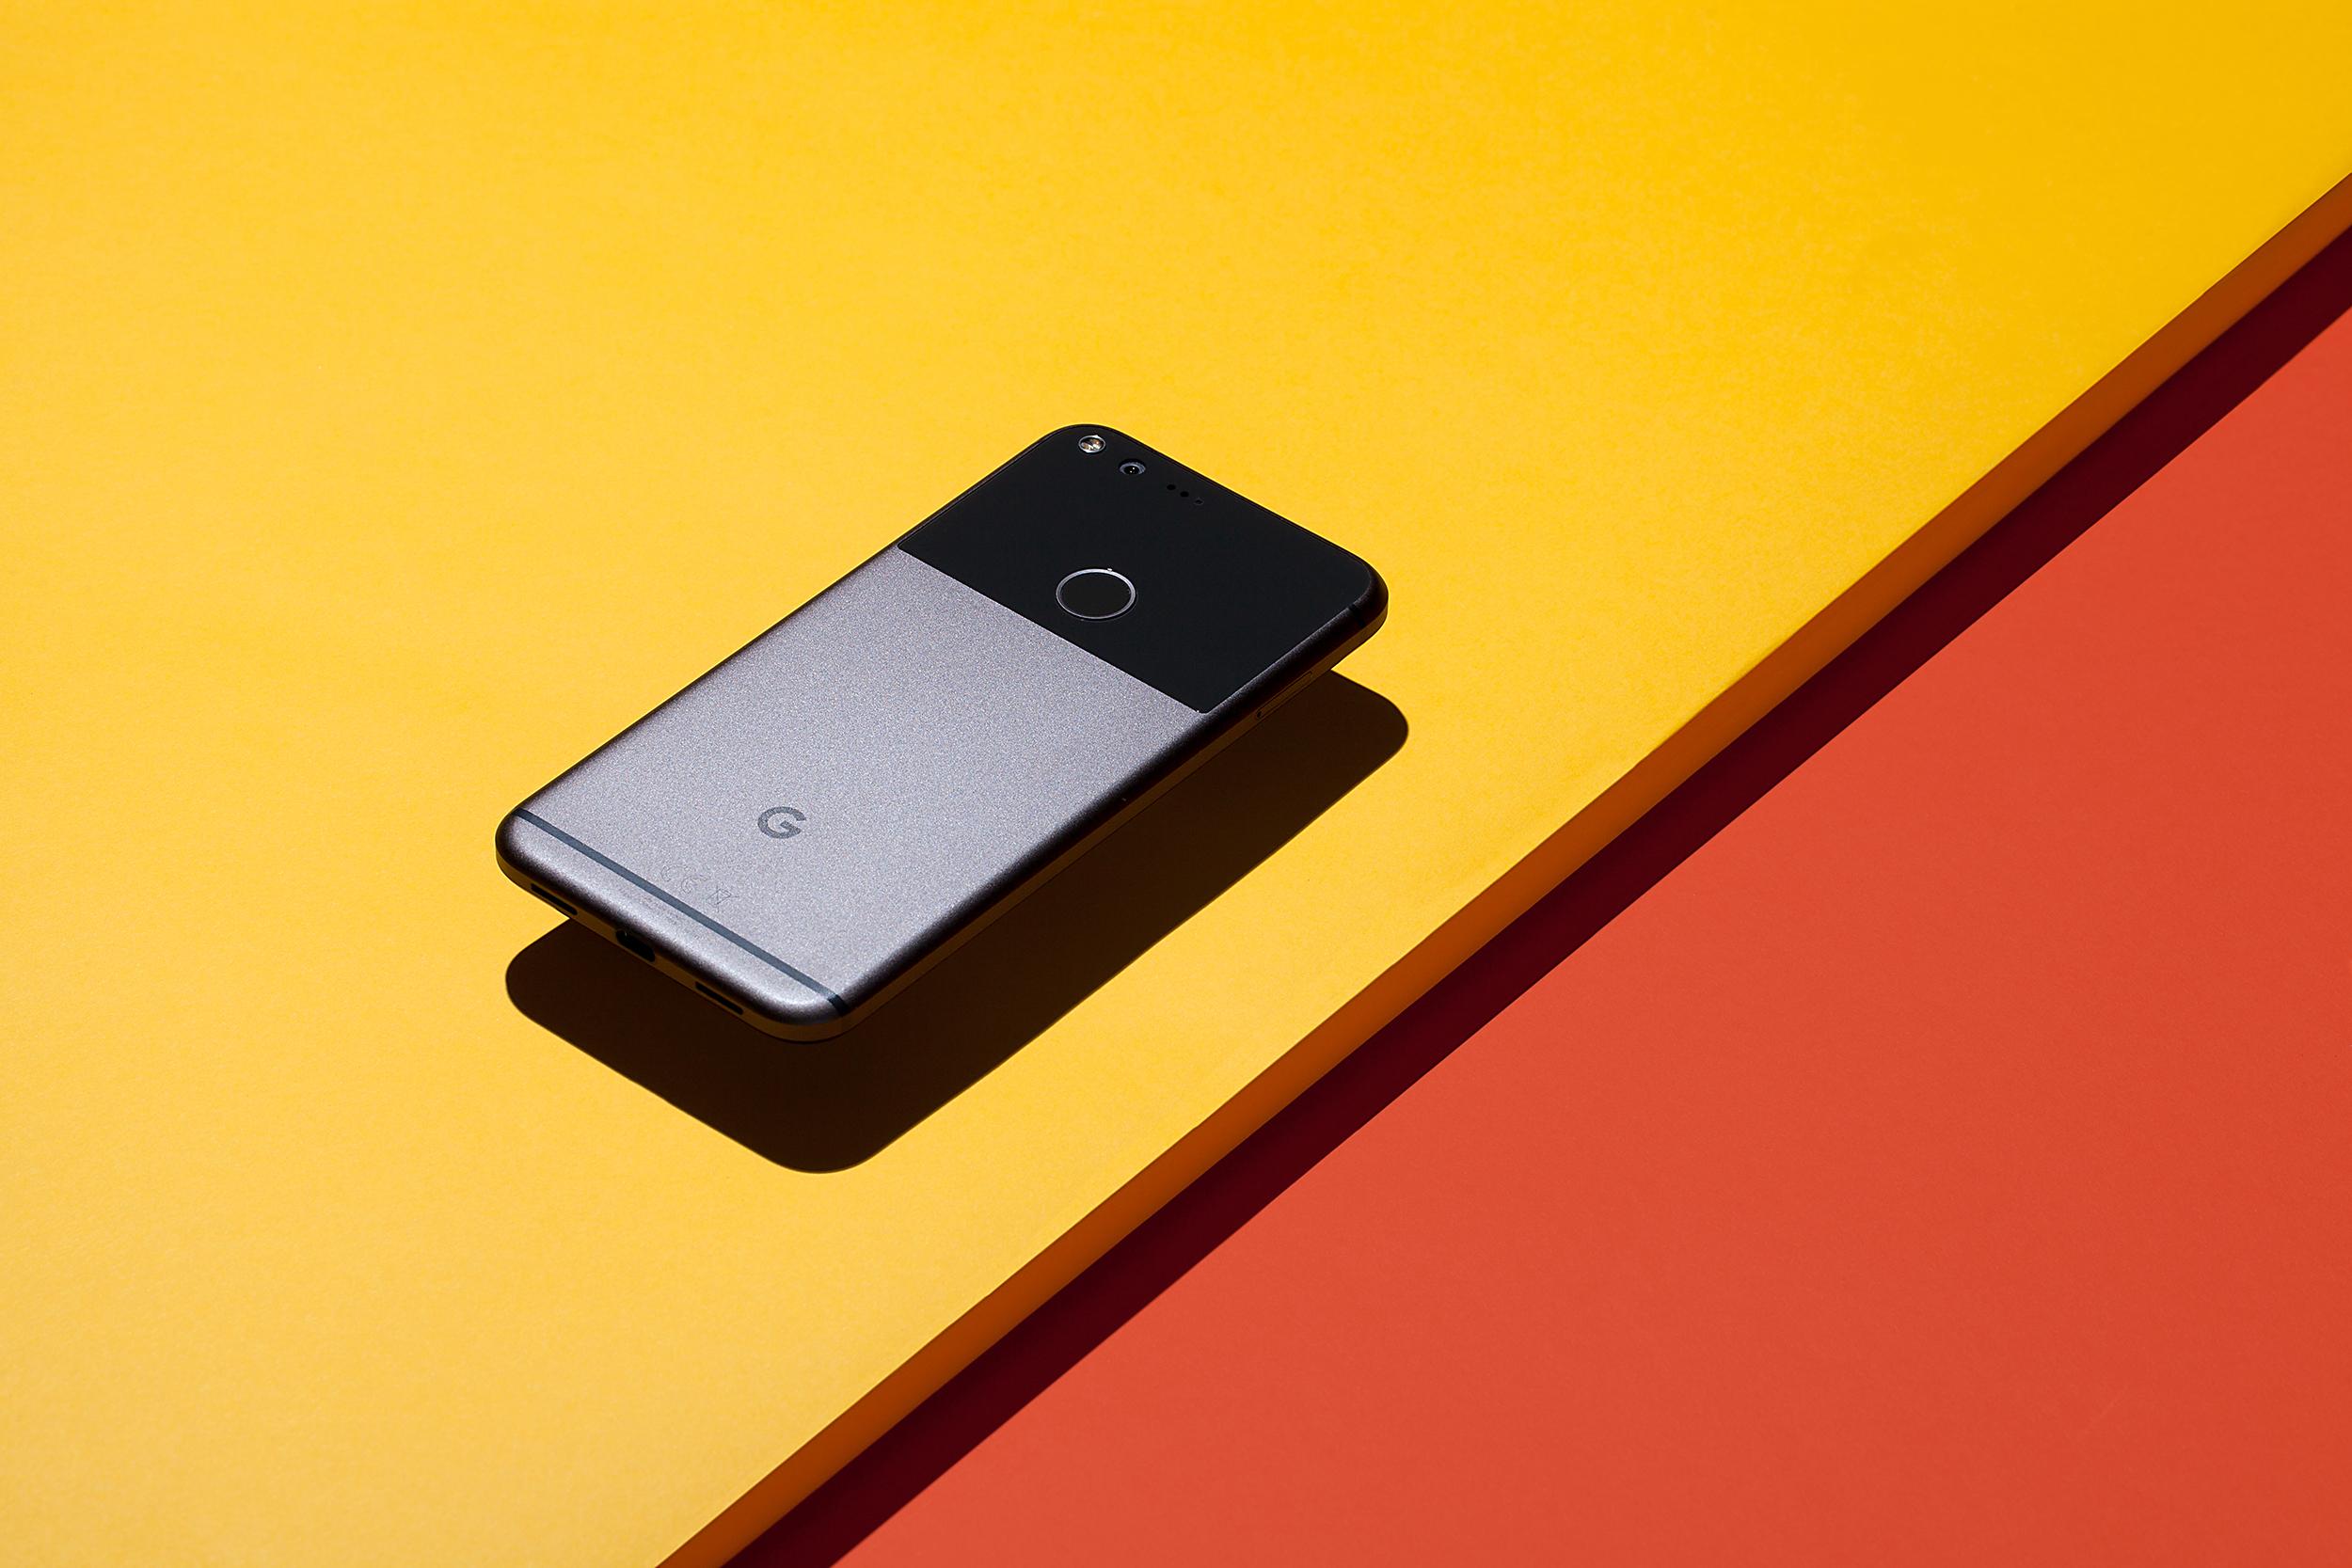 Google Pixel, HD Computer, 4k Wallpapers, Images